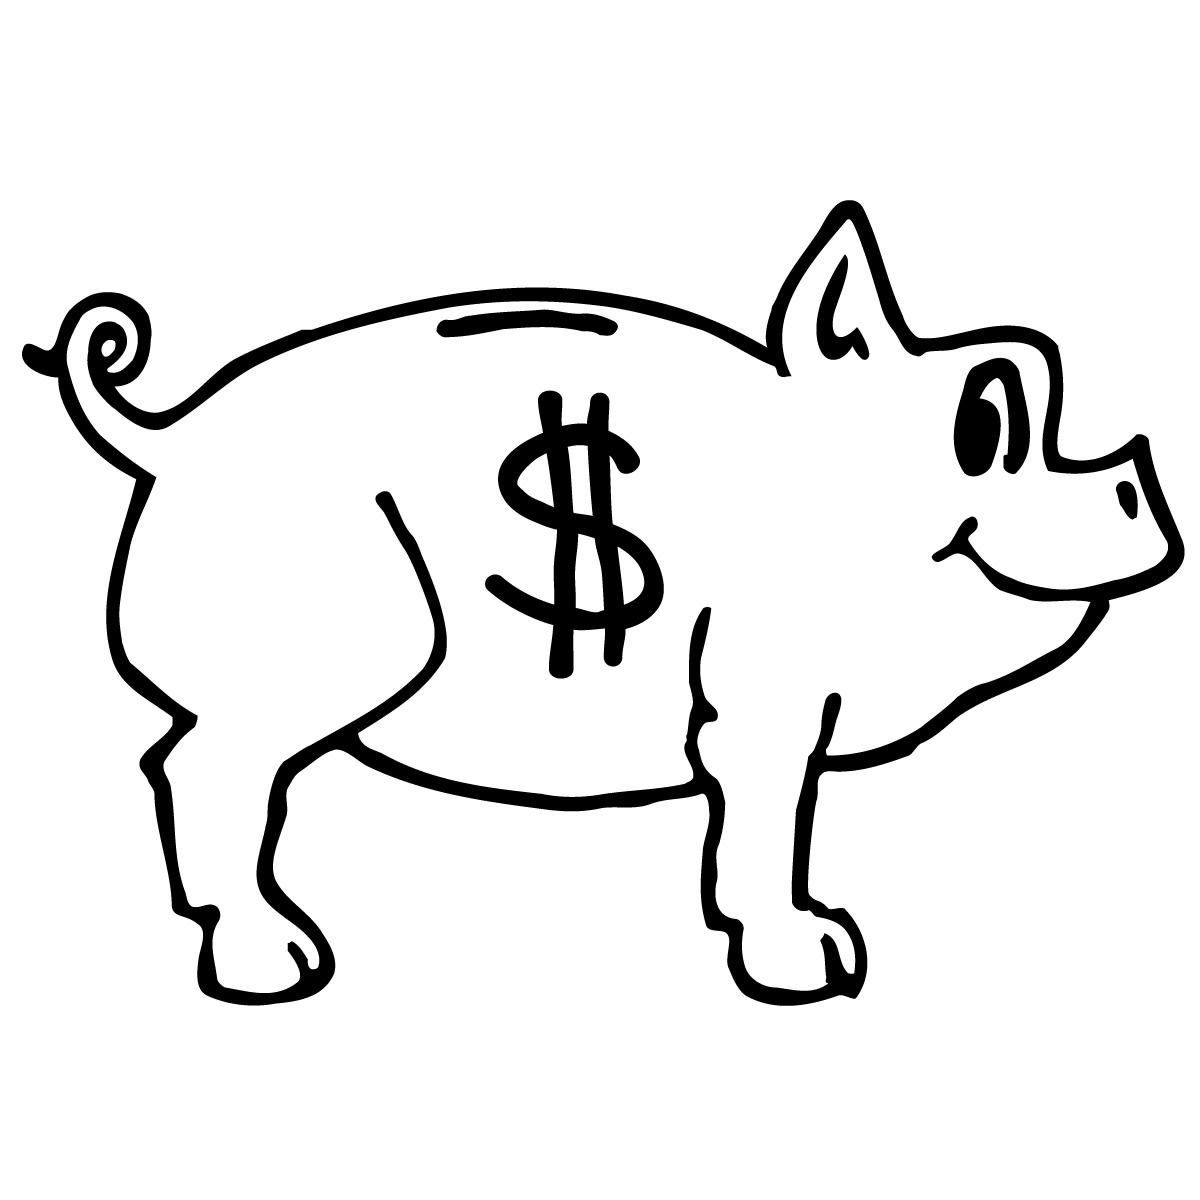 Bank clip art 2